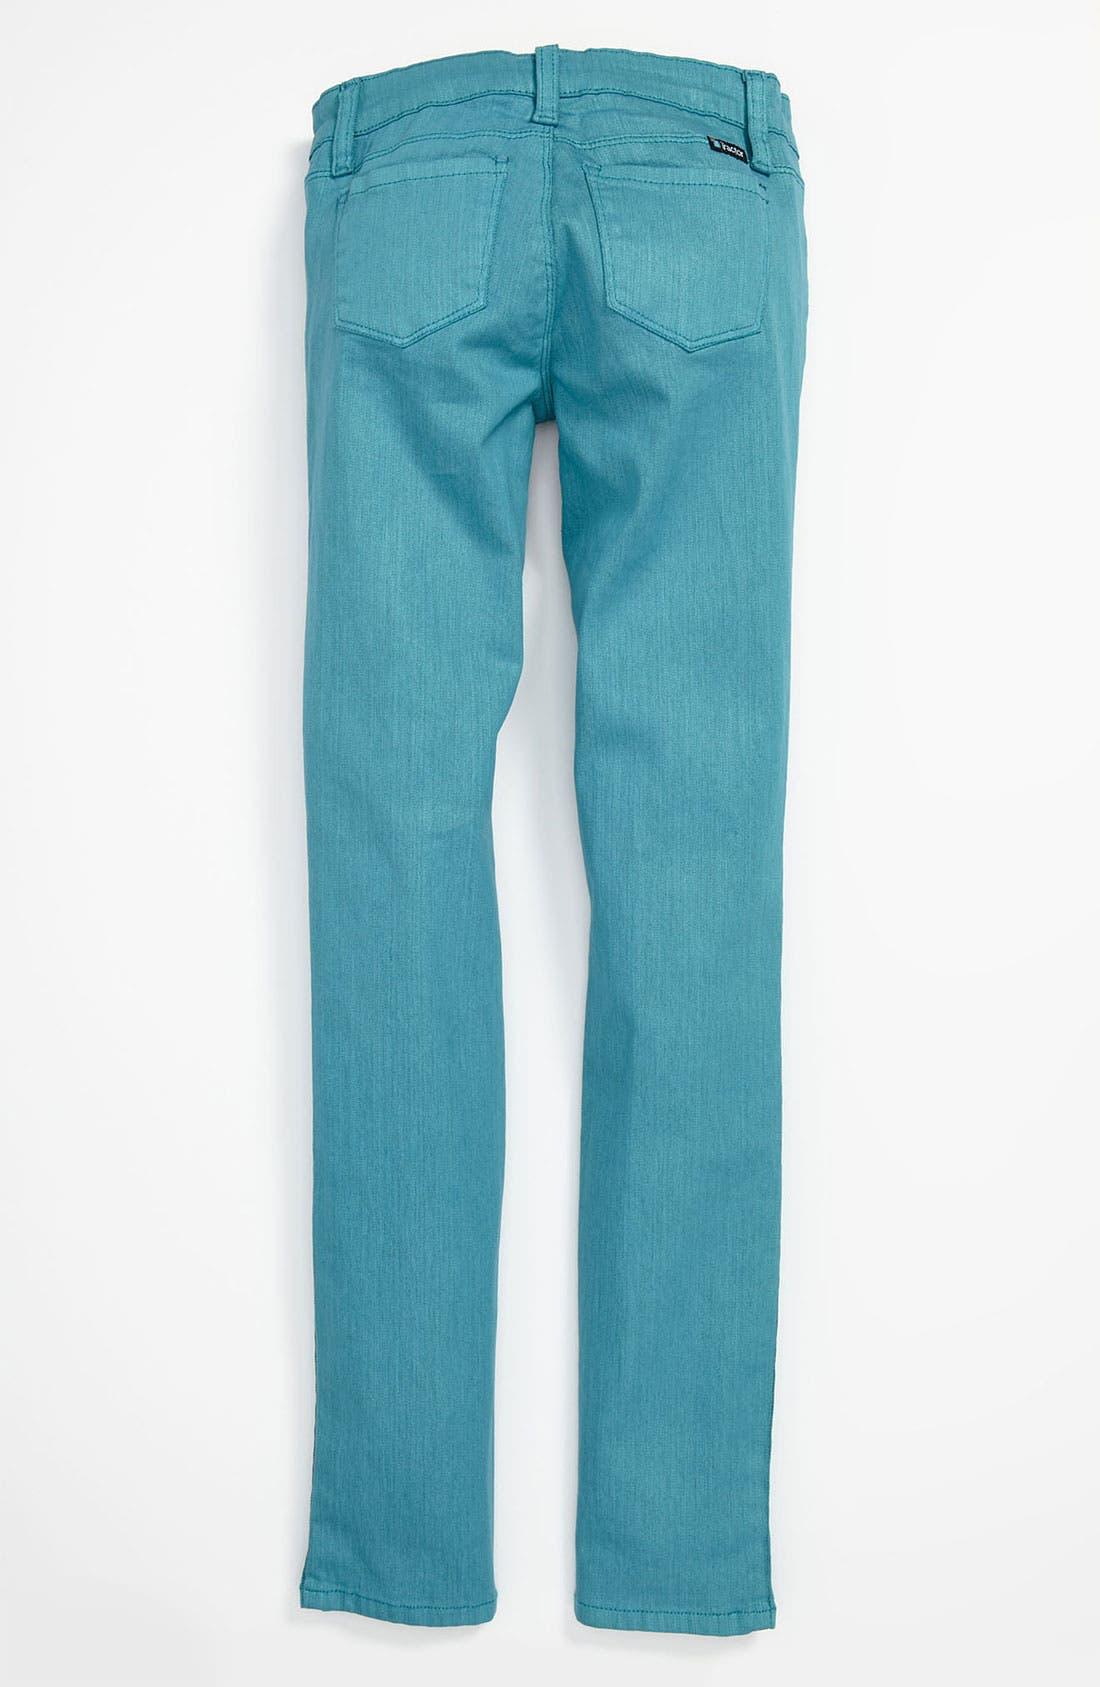 Alternate Image 1 Selected - Tractr Coated Denim Skinny Leg Jeans (Big Girls)